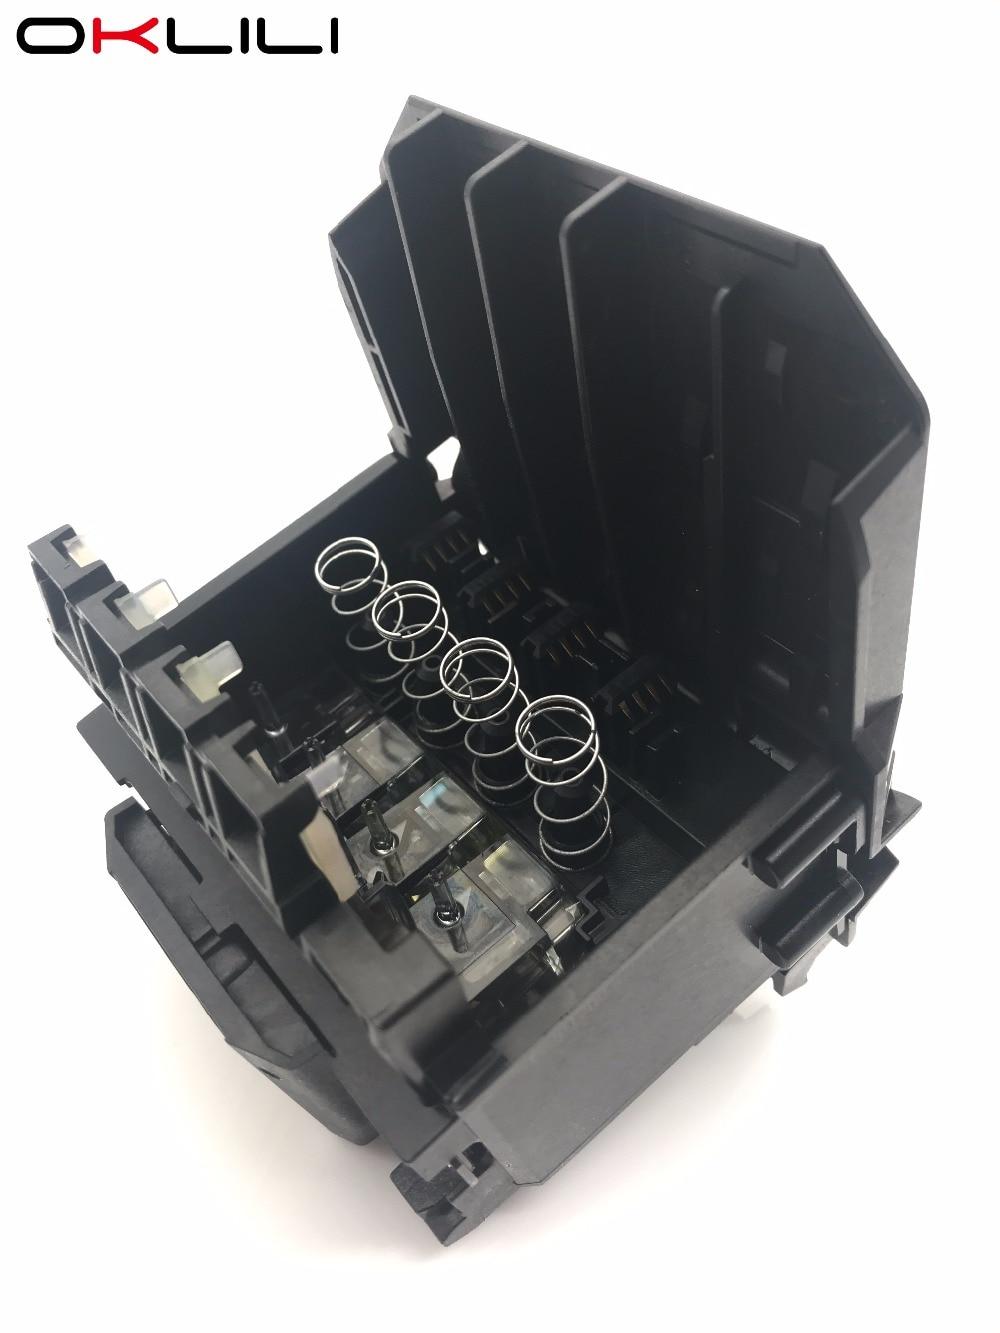 1X CB863-80002A 932 933 932XL 933XL Printhead Printer Print head for HP Officejet 6060 6060e 6100 6100e 6600 6700 7110 7600 7610